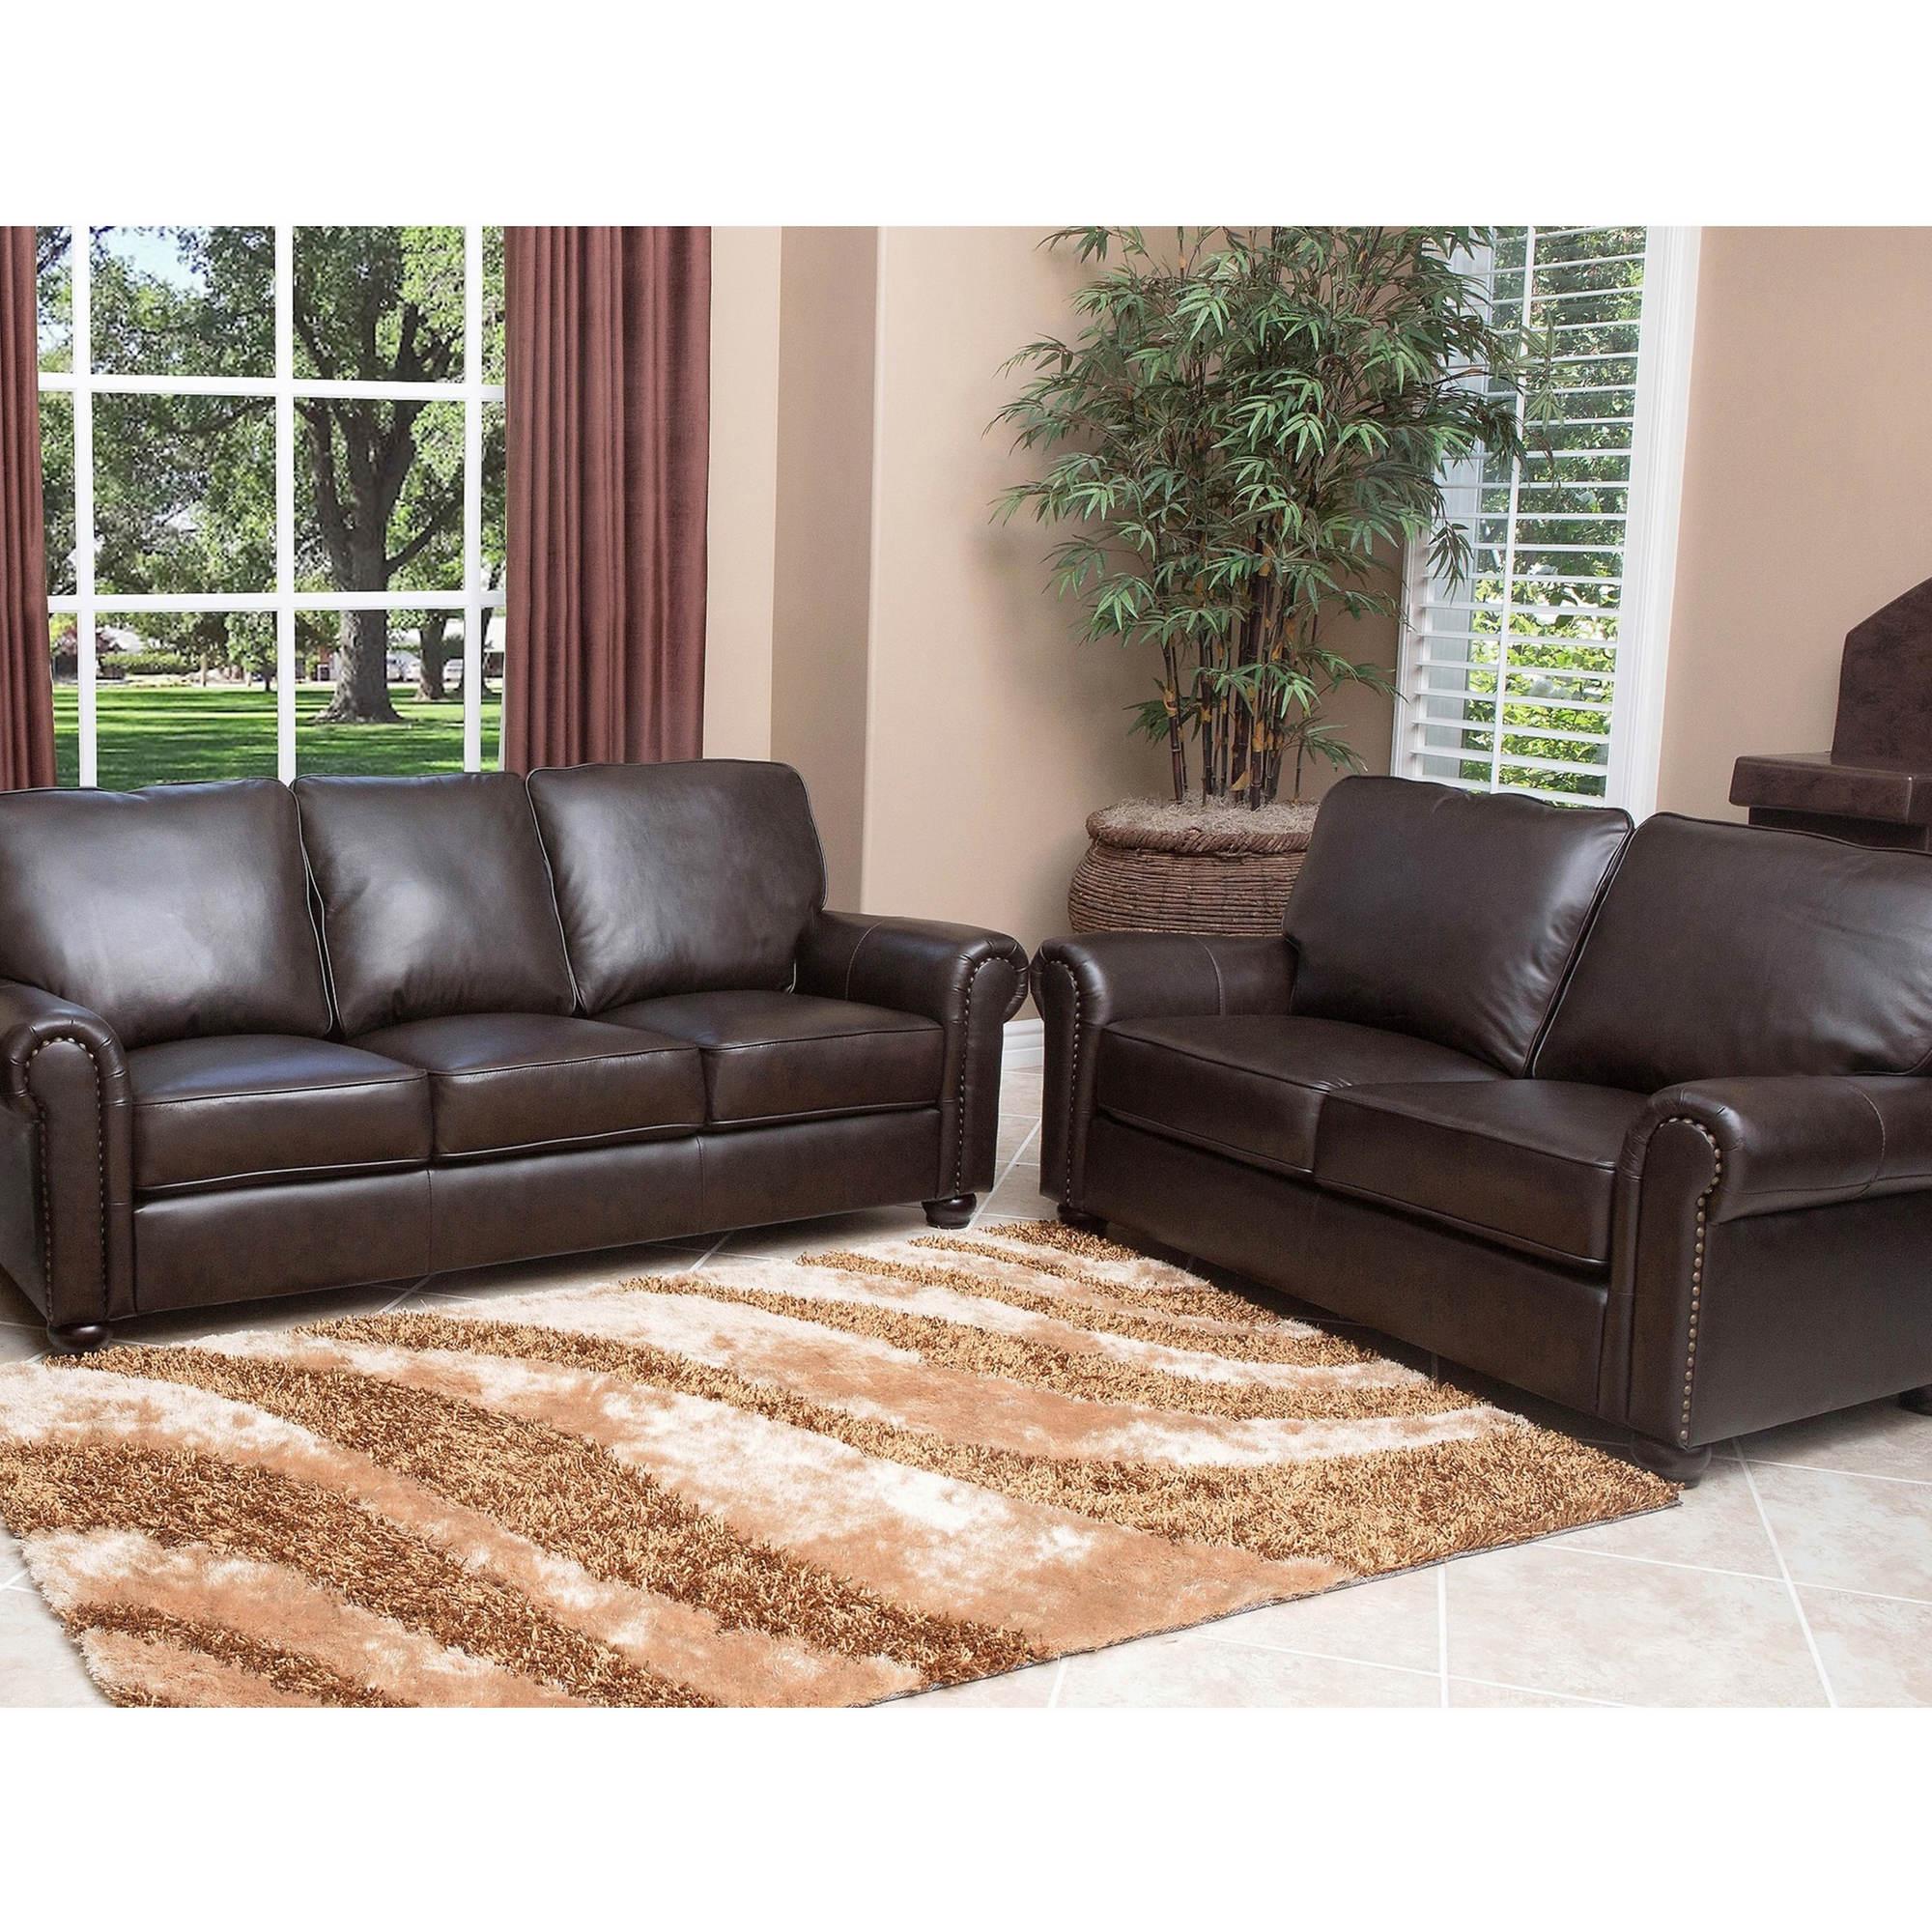 Dark Brown Leather Furniture Set Sofa Loveseat Accent: Abbyson Living Bedford 2-Pc. Top-Grain Italian Leather